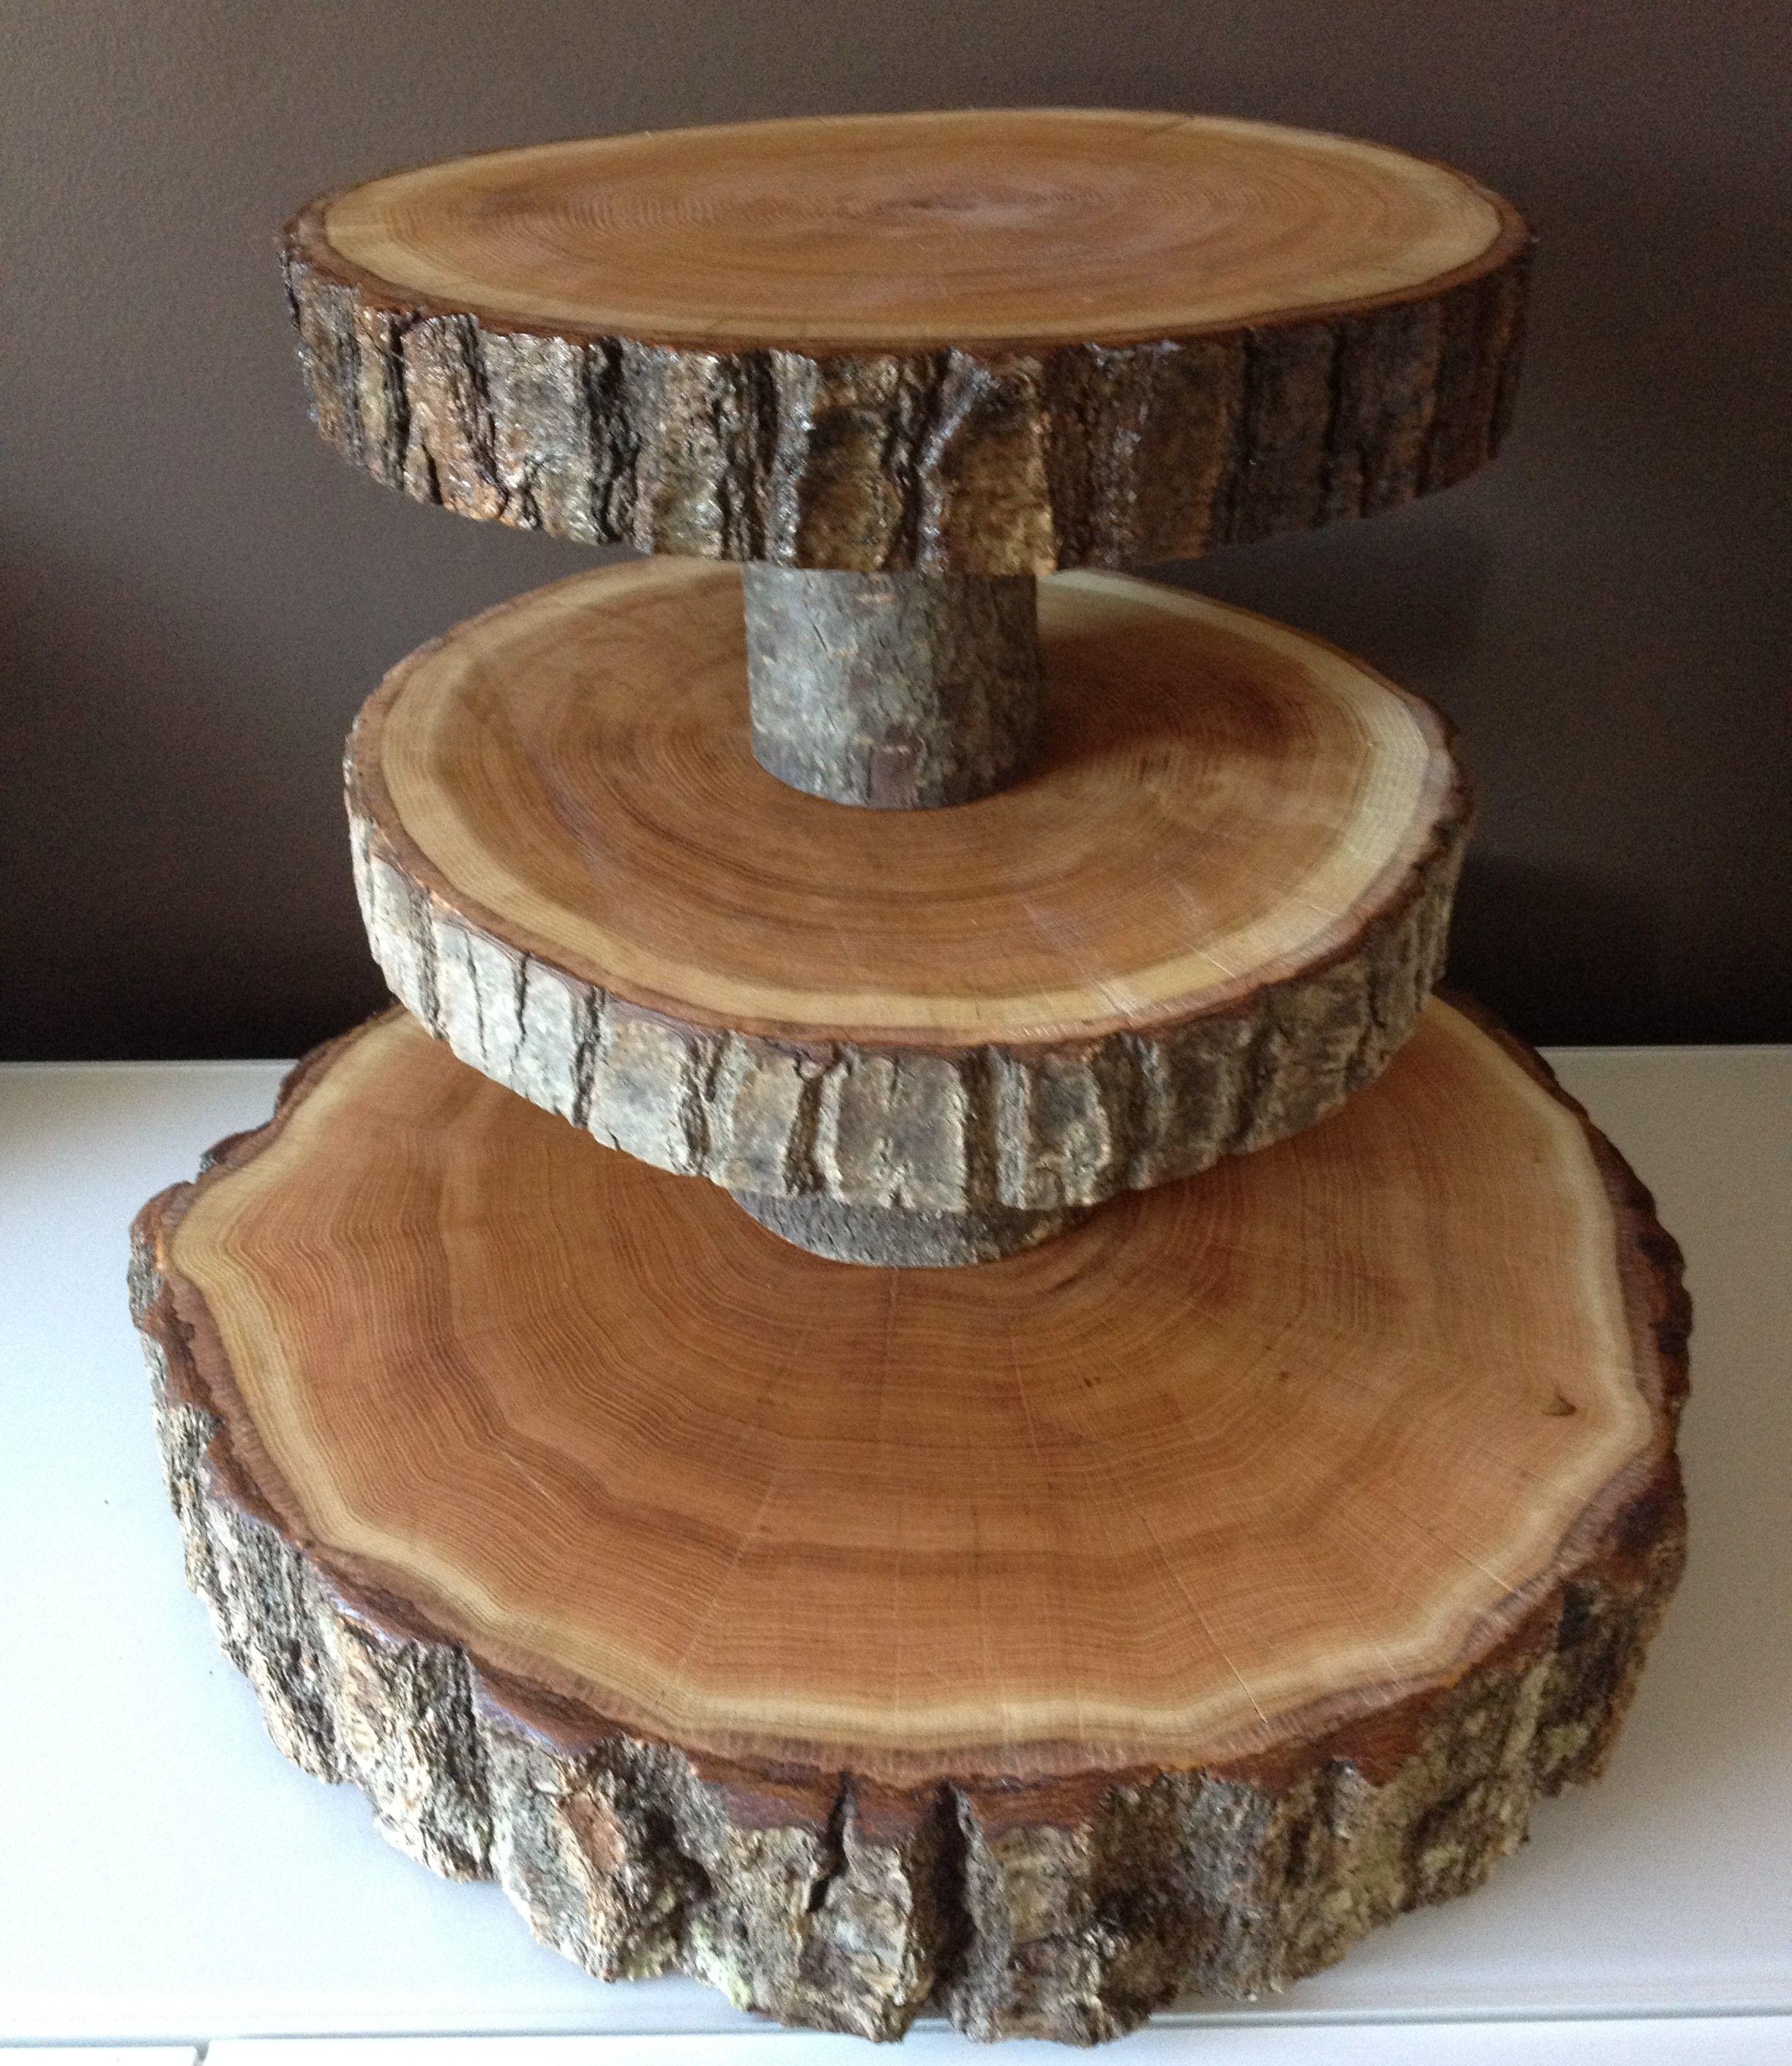 Wood Slice Wedding Cake Stands Wood Rounds Stump Cake Stand Wood Cupcake Stand Wood Cake Stand Wood Wedding Cakes